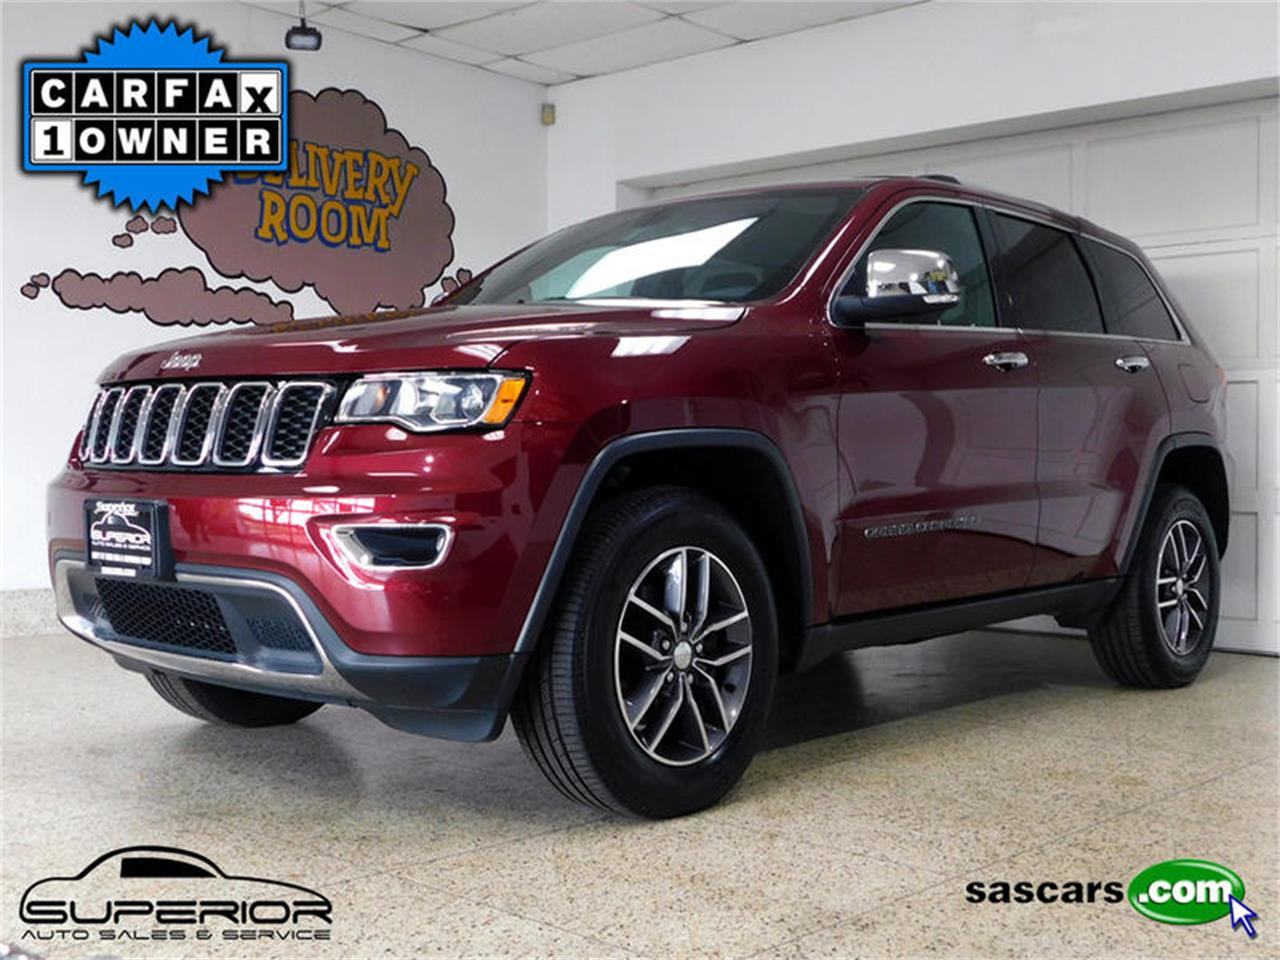 for sale 2017 jeep grand cherokee in hamburg, new york cars - hamburg, ny at geebo